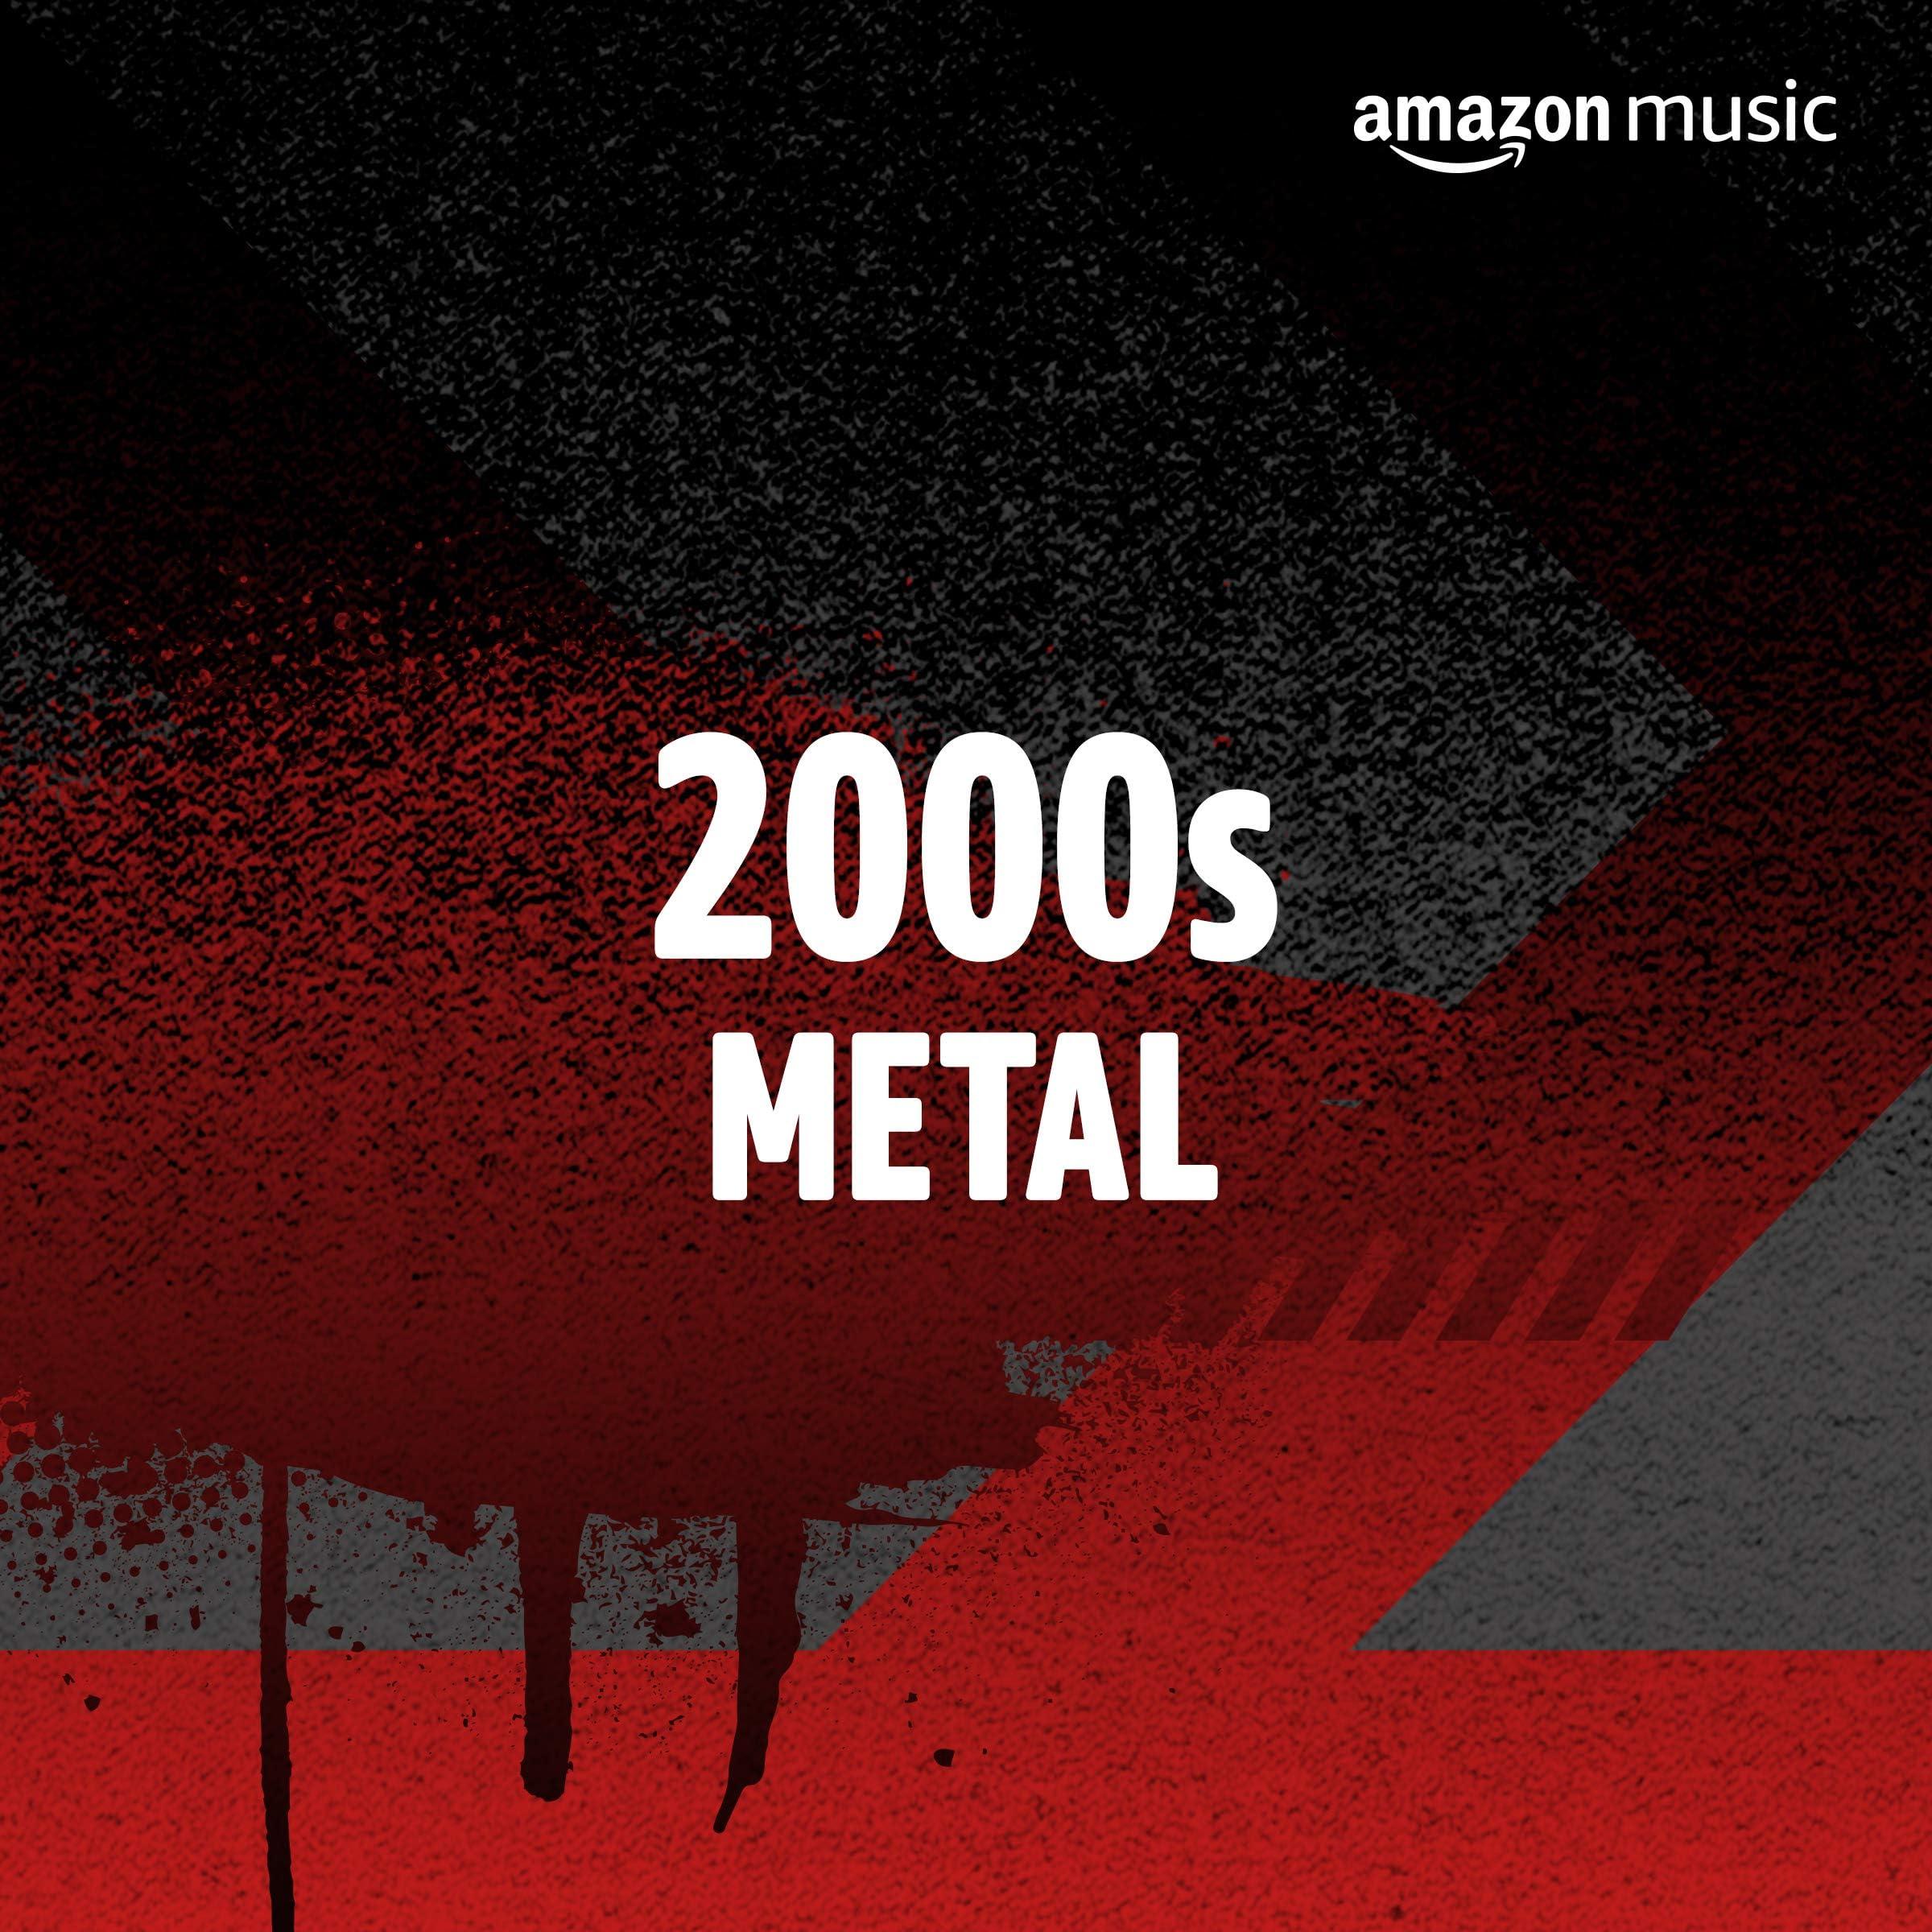 00s Metal